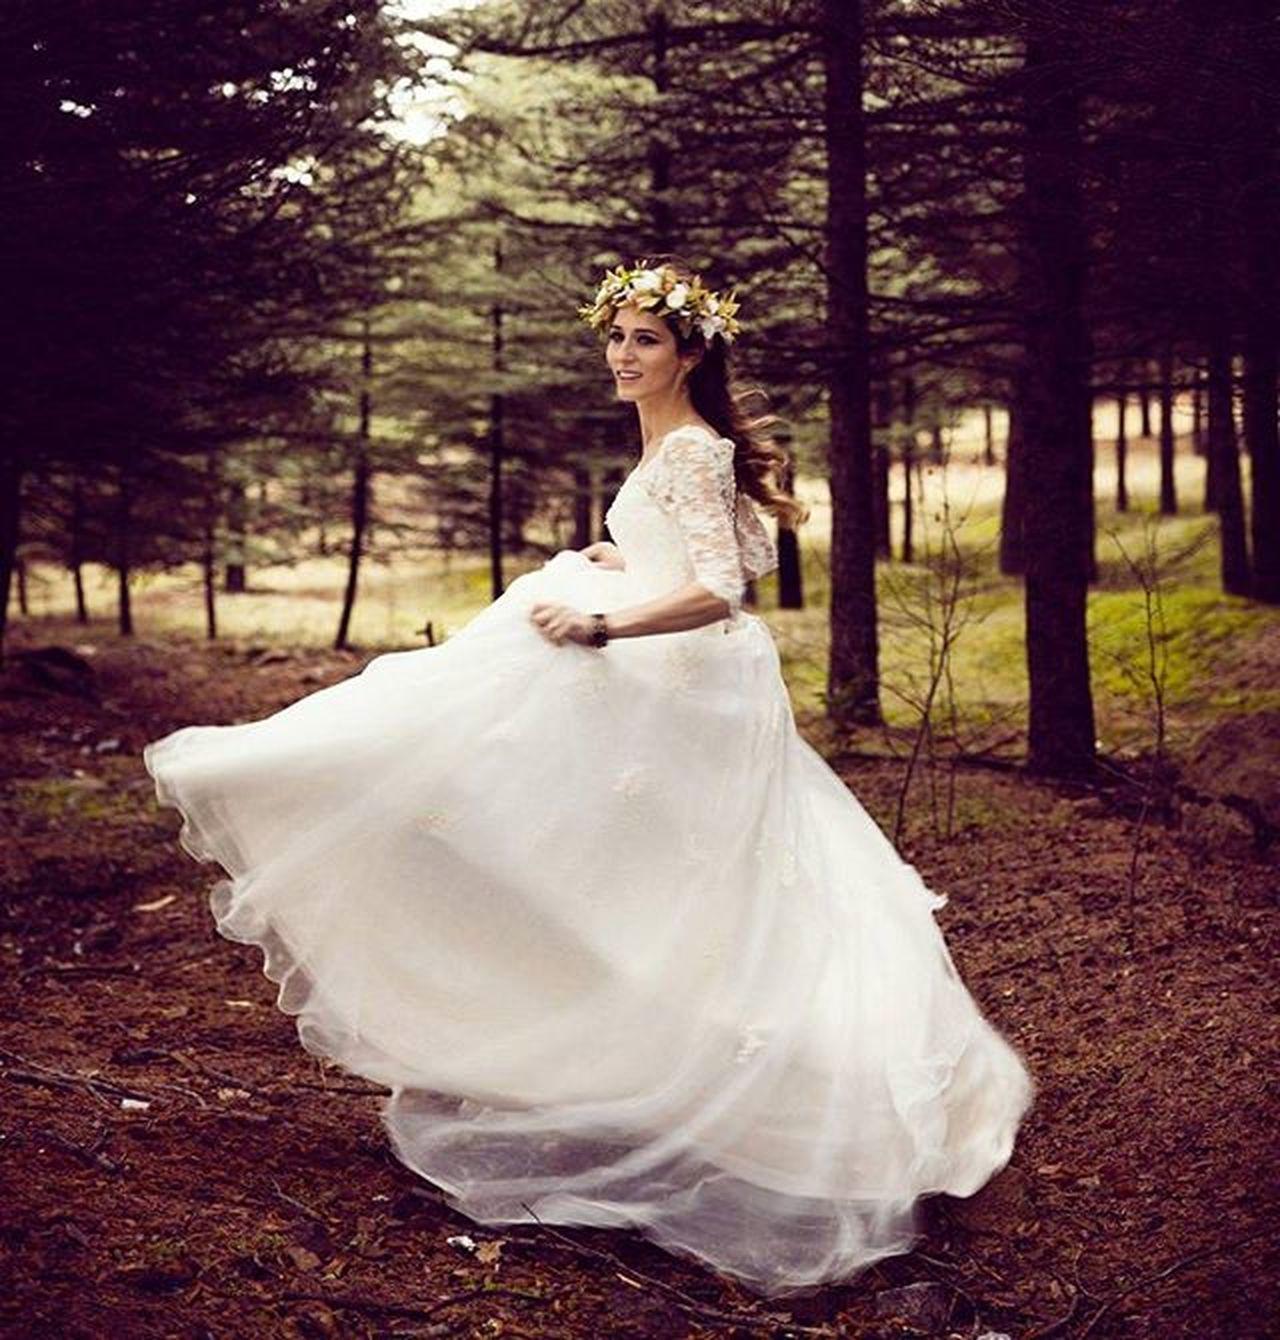 Photo:@mrrywedding makeup&hair:@evrimmemili accessories:@be.boutique Wedding Bride Photoshoot Makeup Accessories Dugun Dugunfotografcisi Dugunfotografi Gelin Gelinmakyajı My Favorite Photo